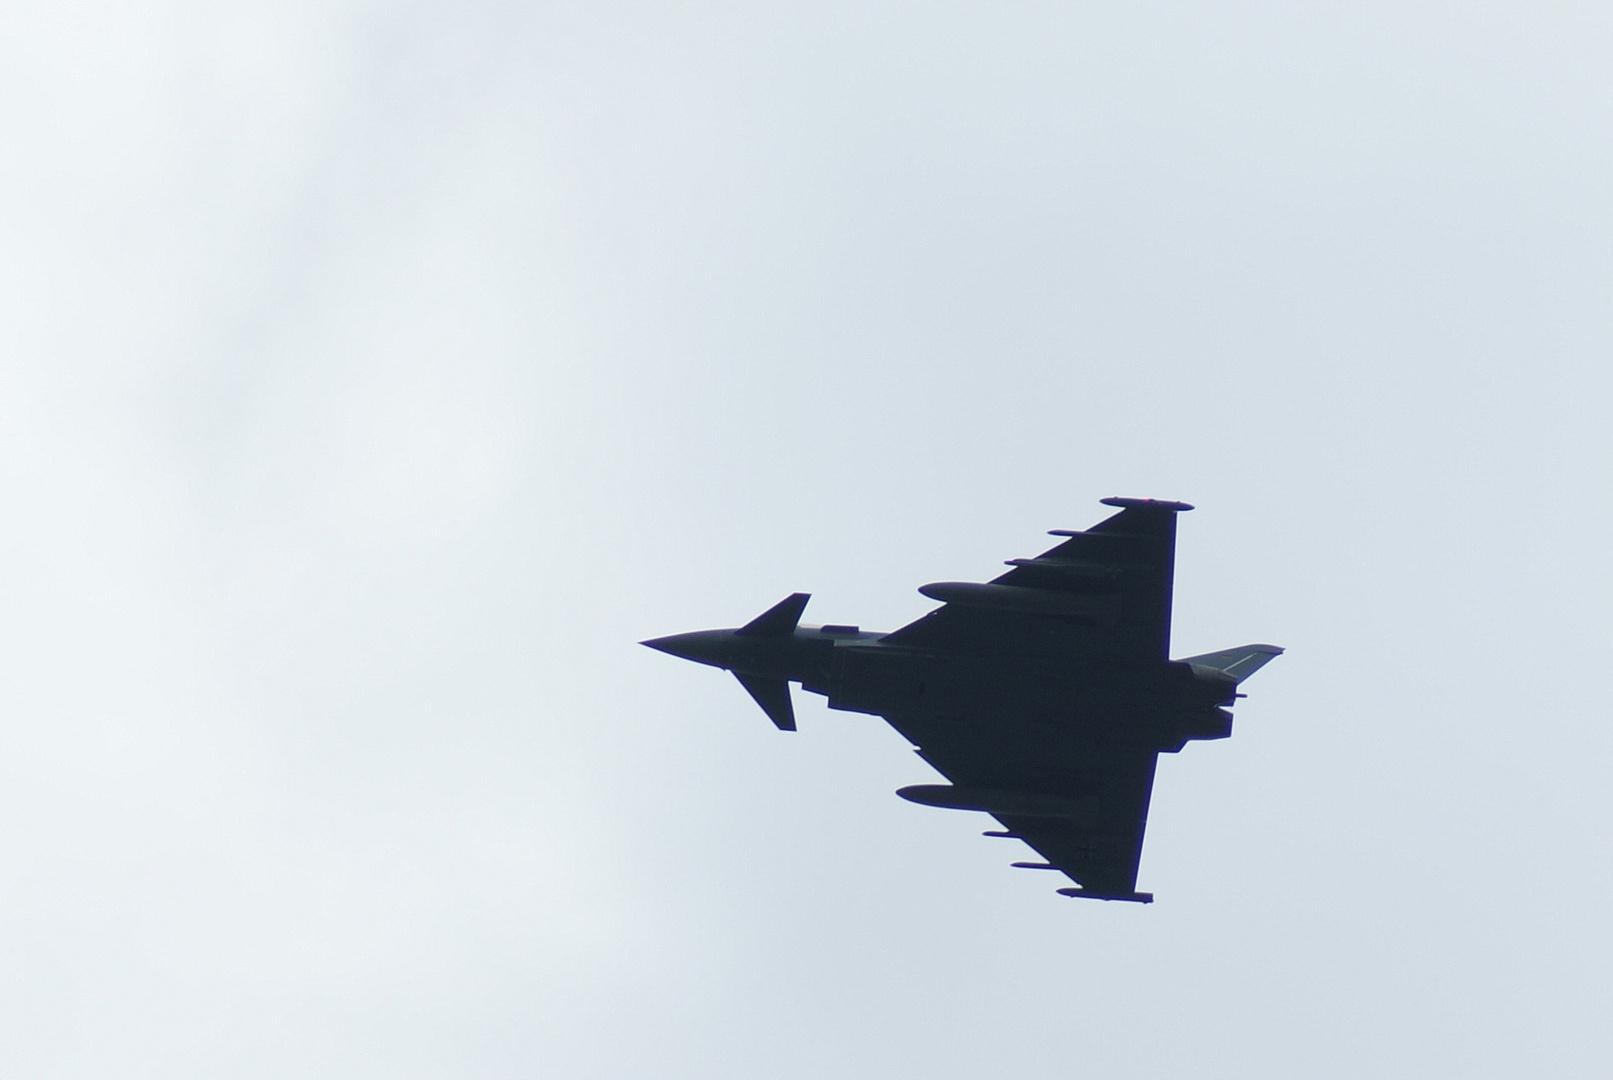 Eurofighter unterwegs...